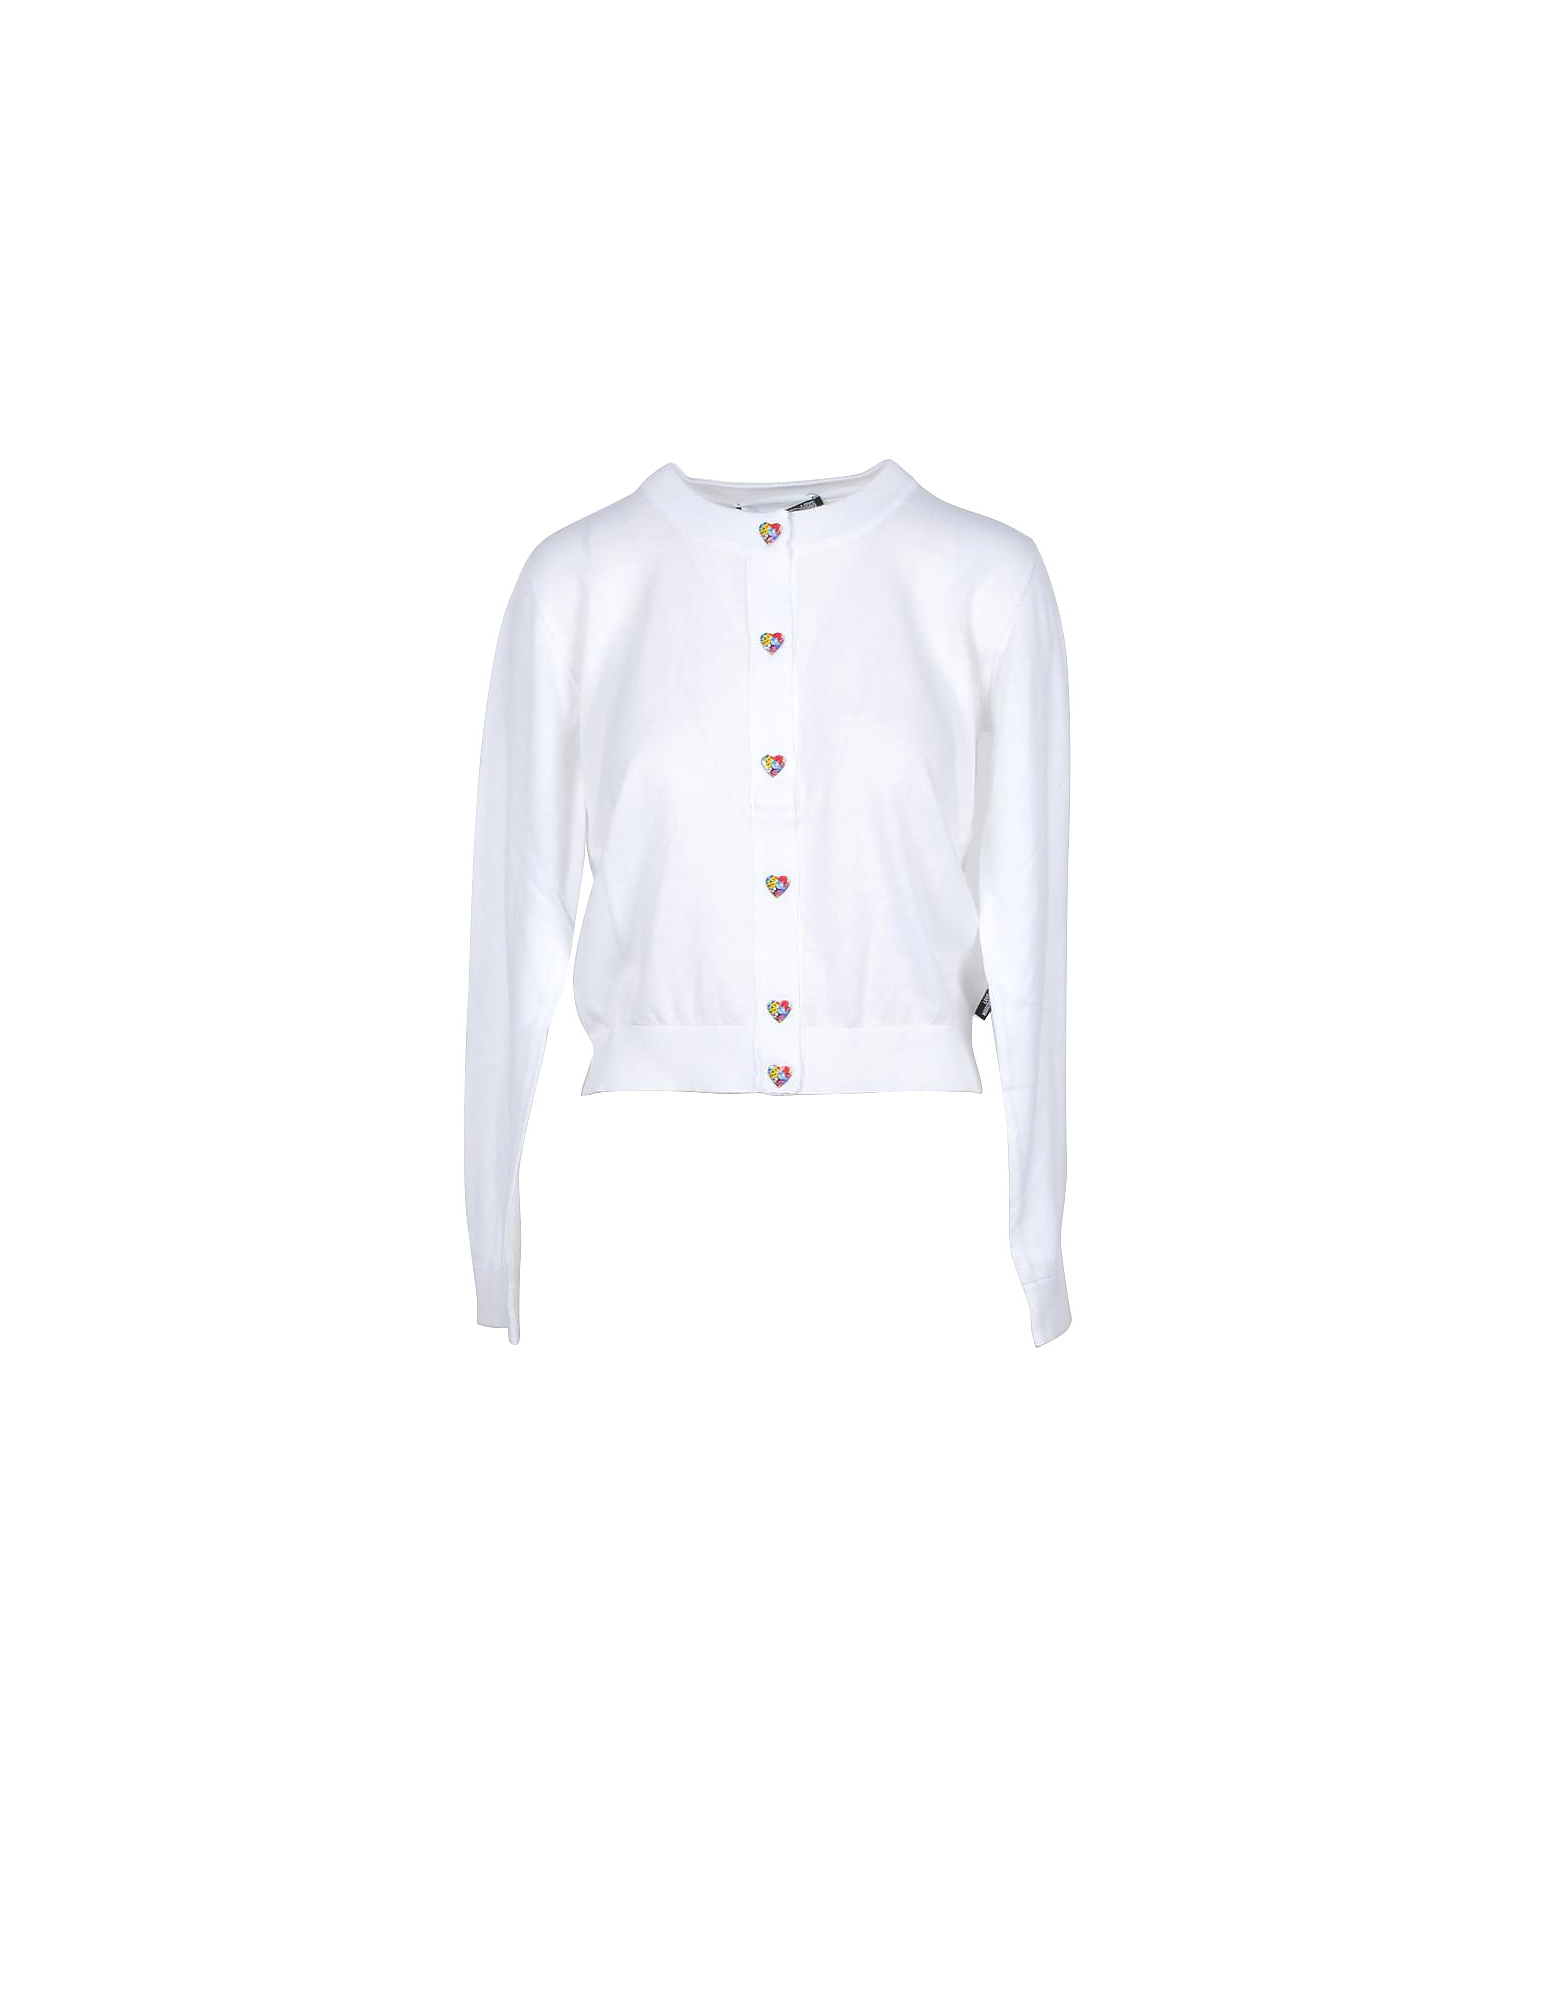 Love Moschino Designer Knitwear, White Cotton Women's Sweater w/Hearts